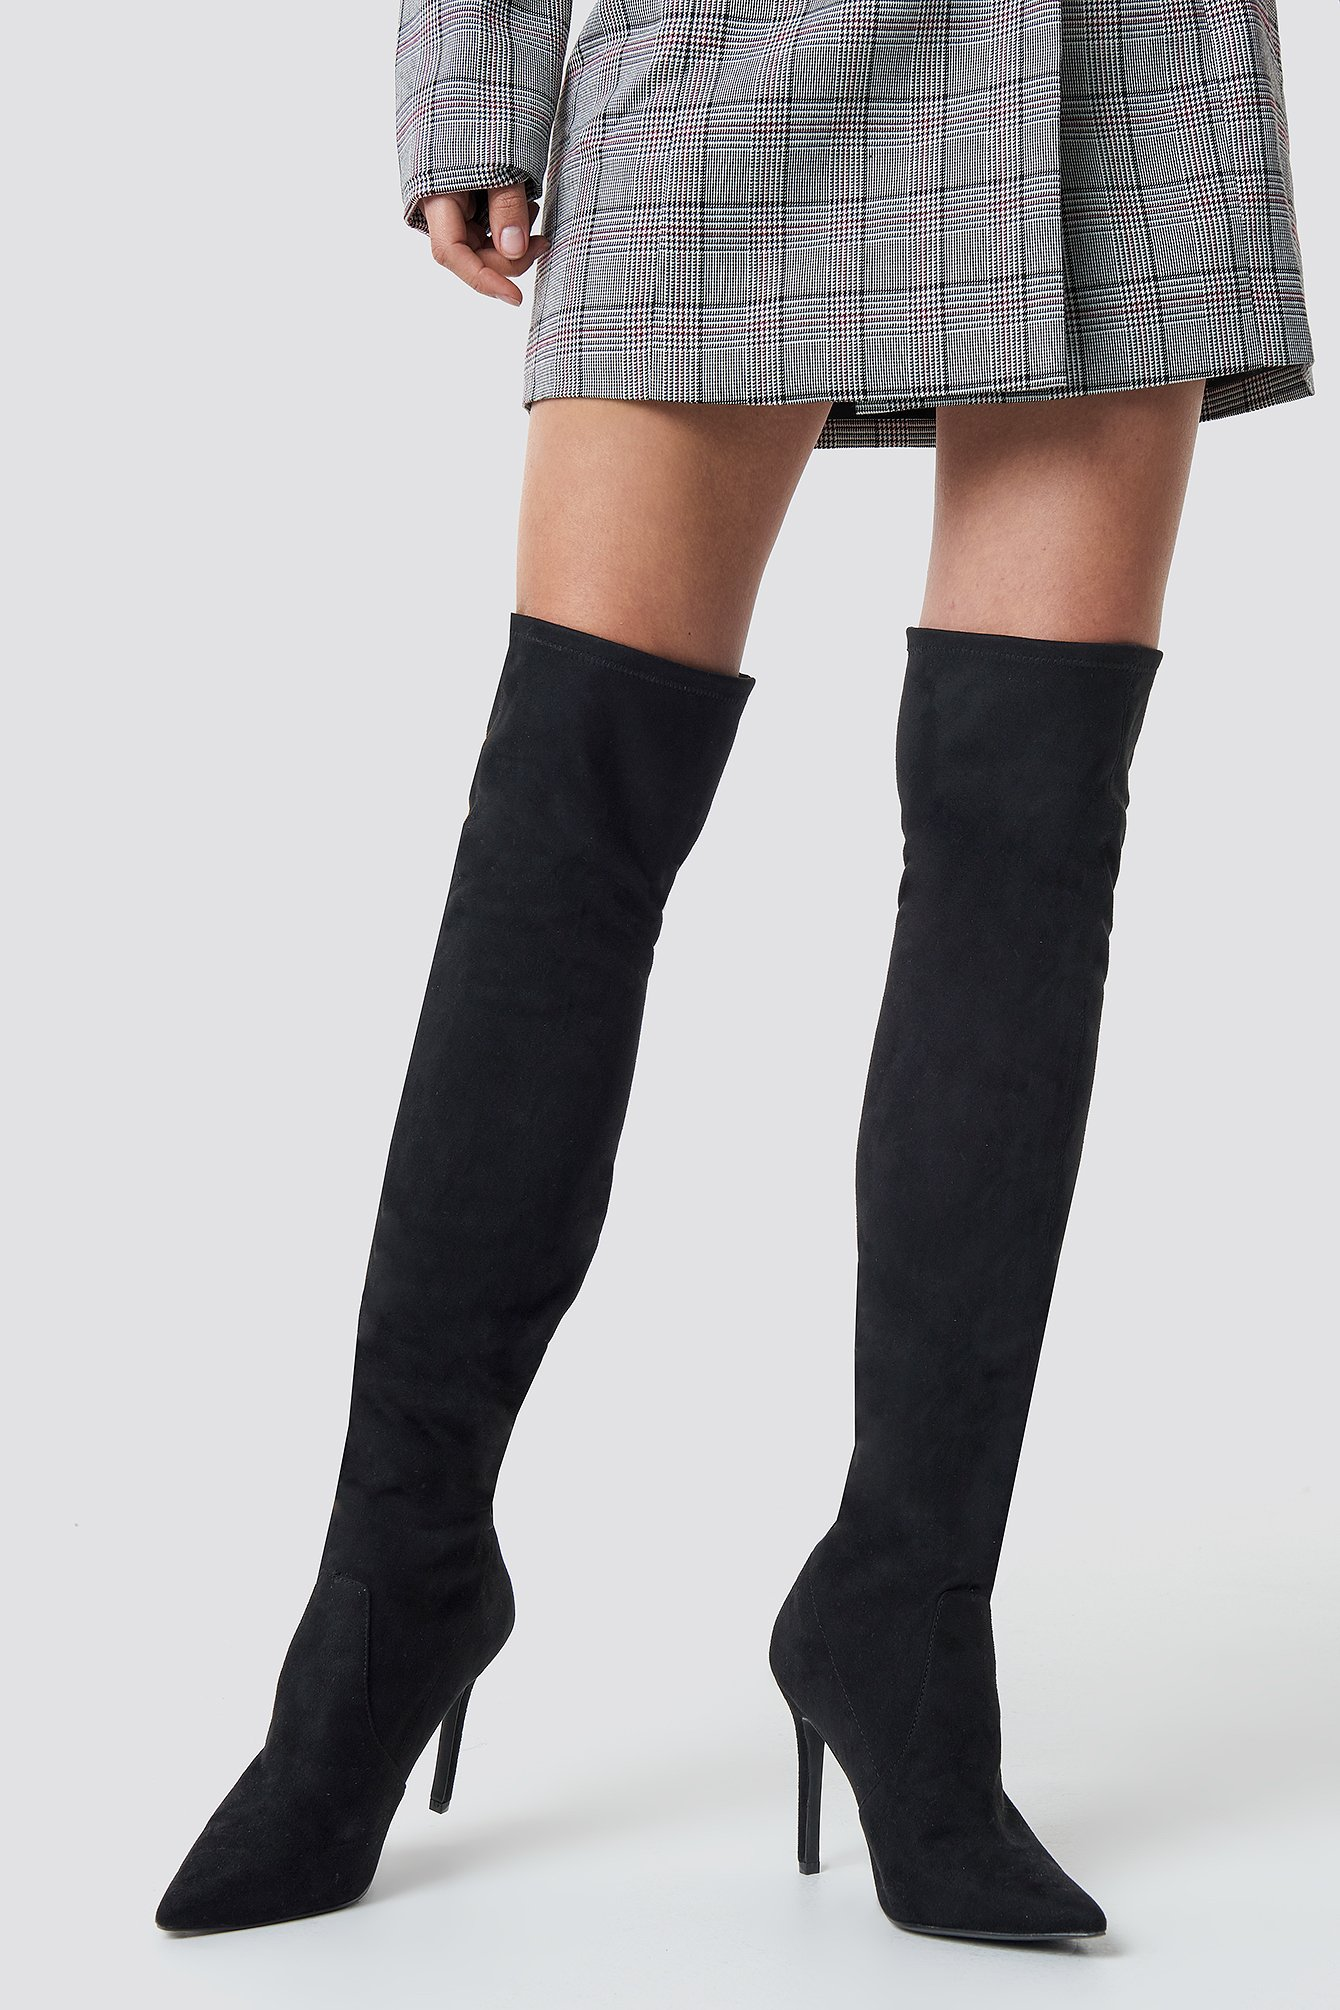 dilara x na-kd -  Overknee Front Seam Boots - Black